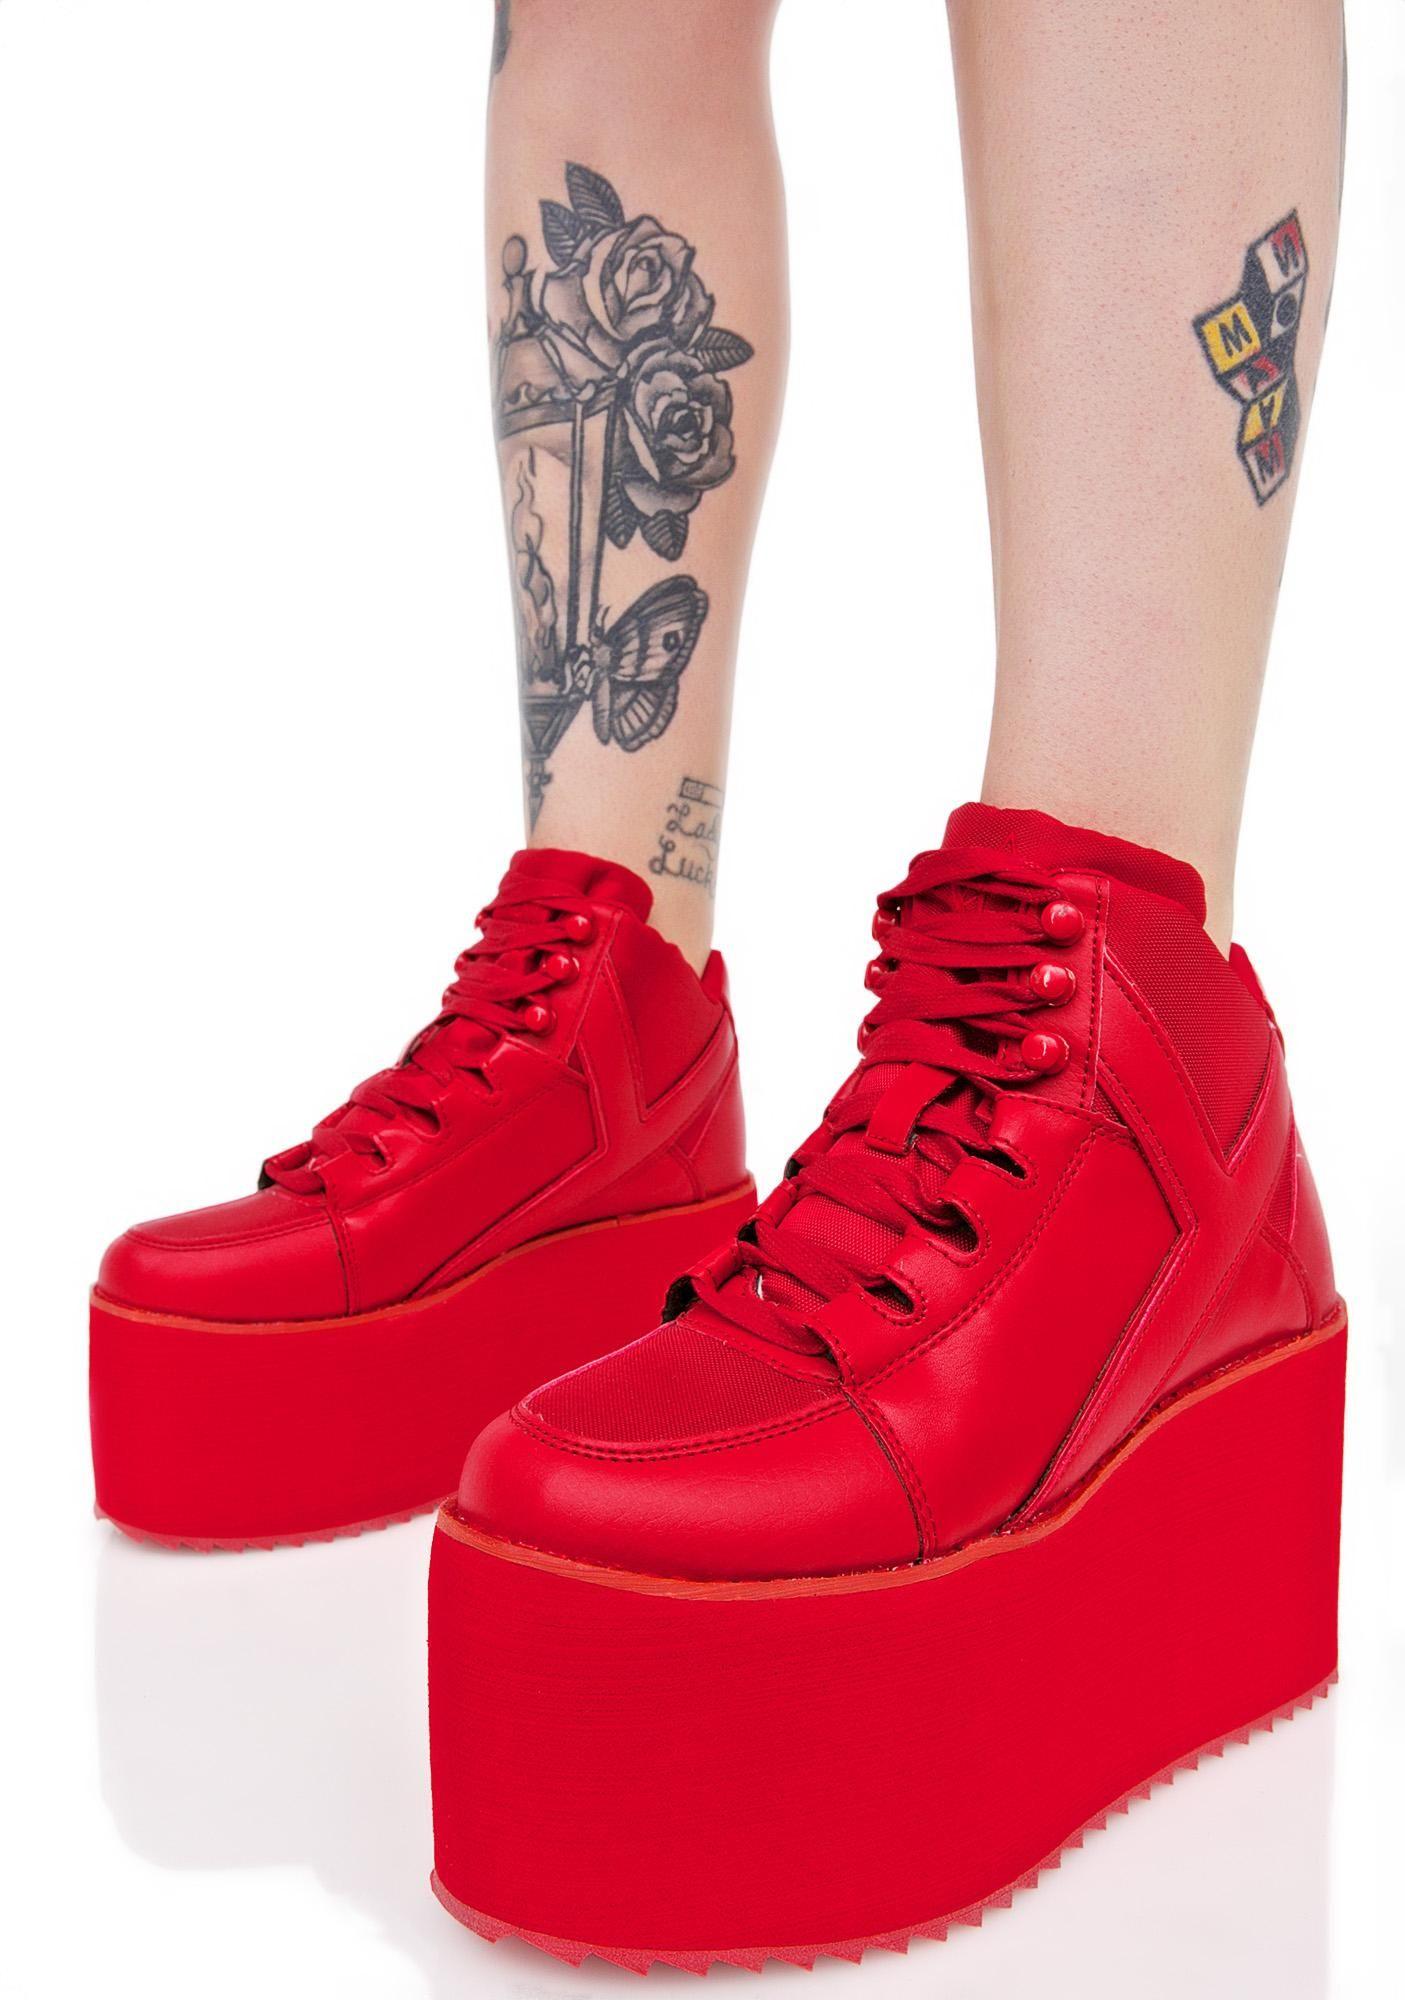 Redd Hot Qozmo Platform Sneakers